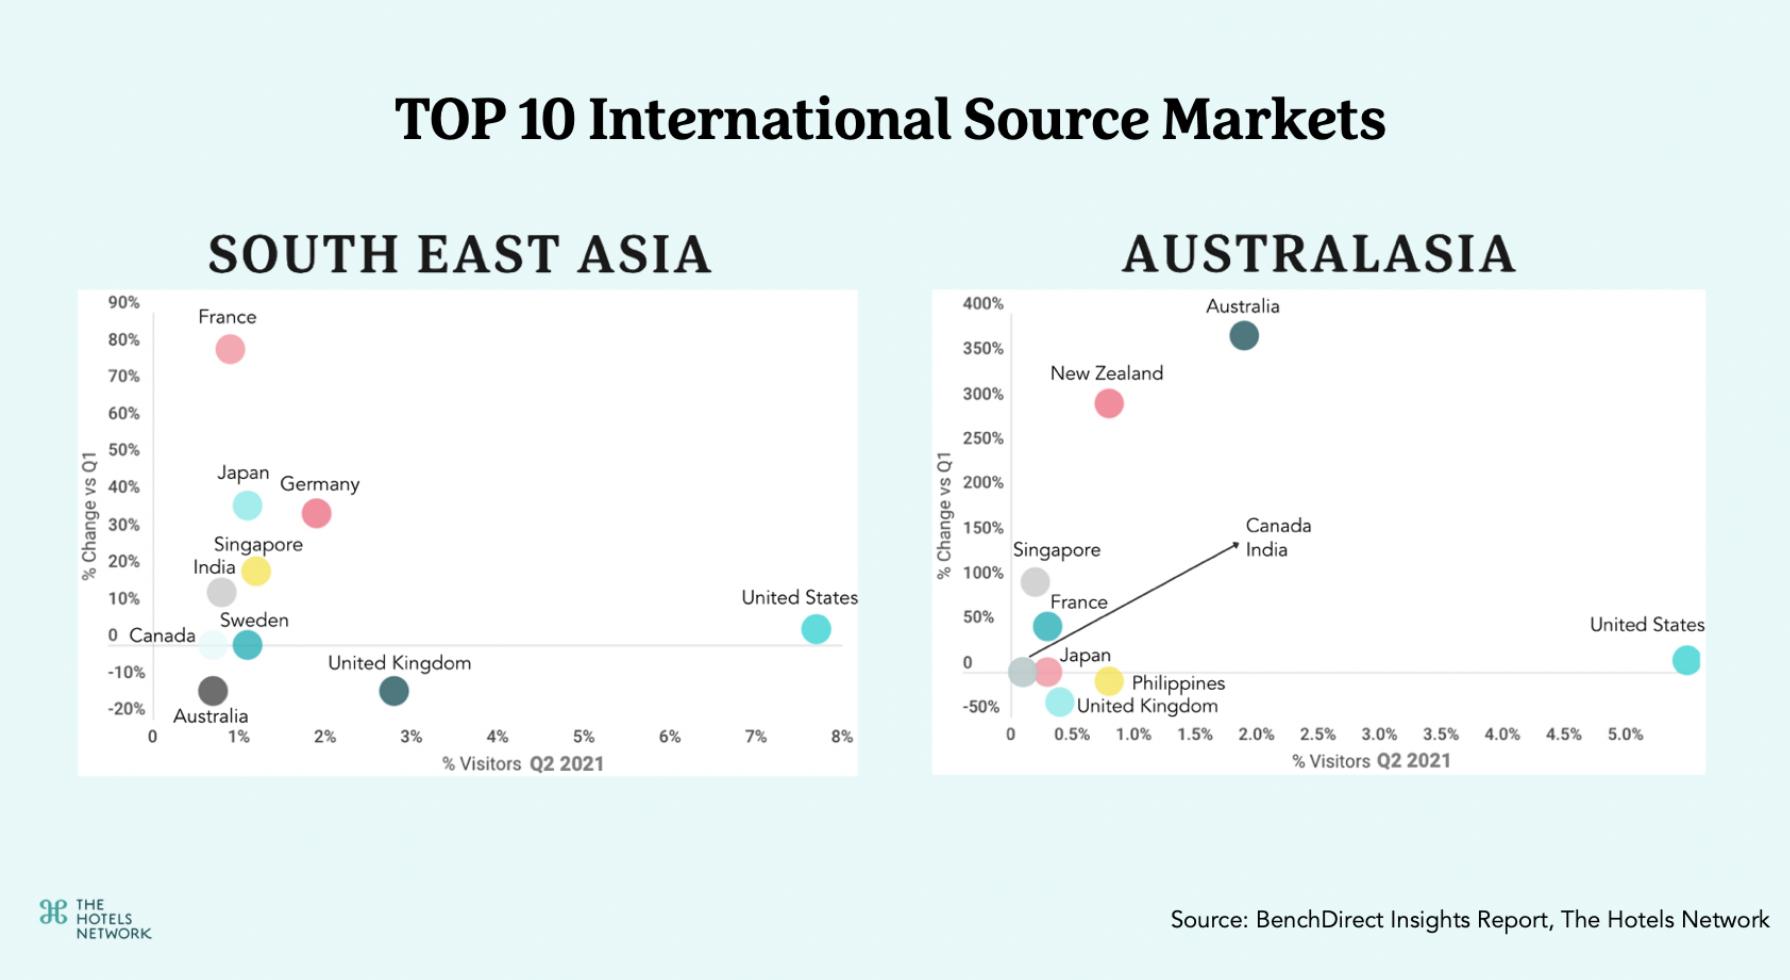 TOP 10 International Source Markets-APAC